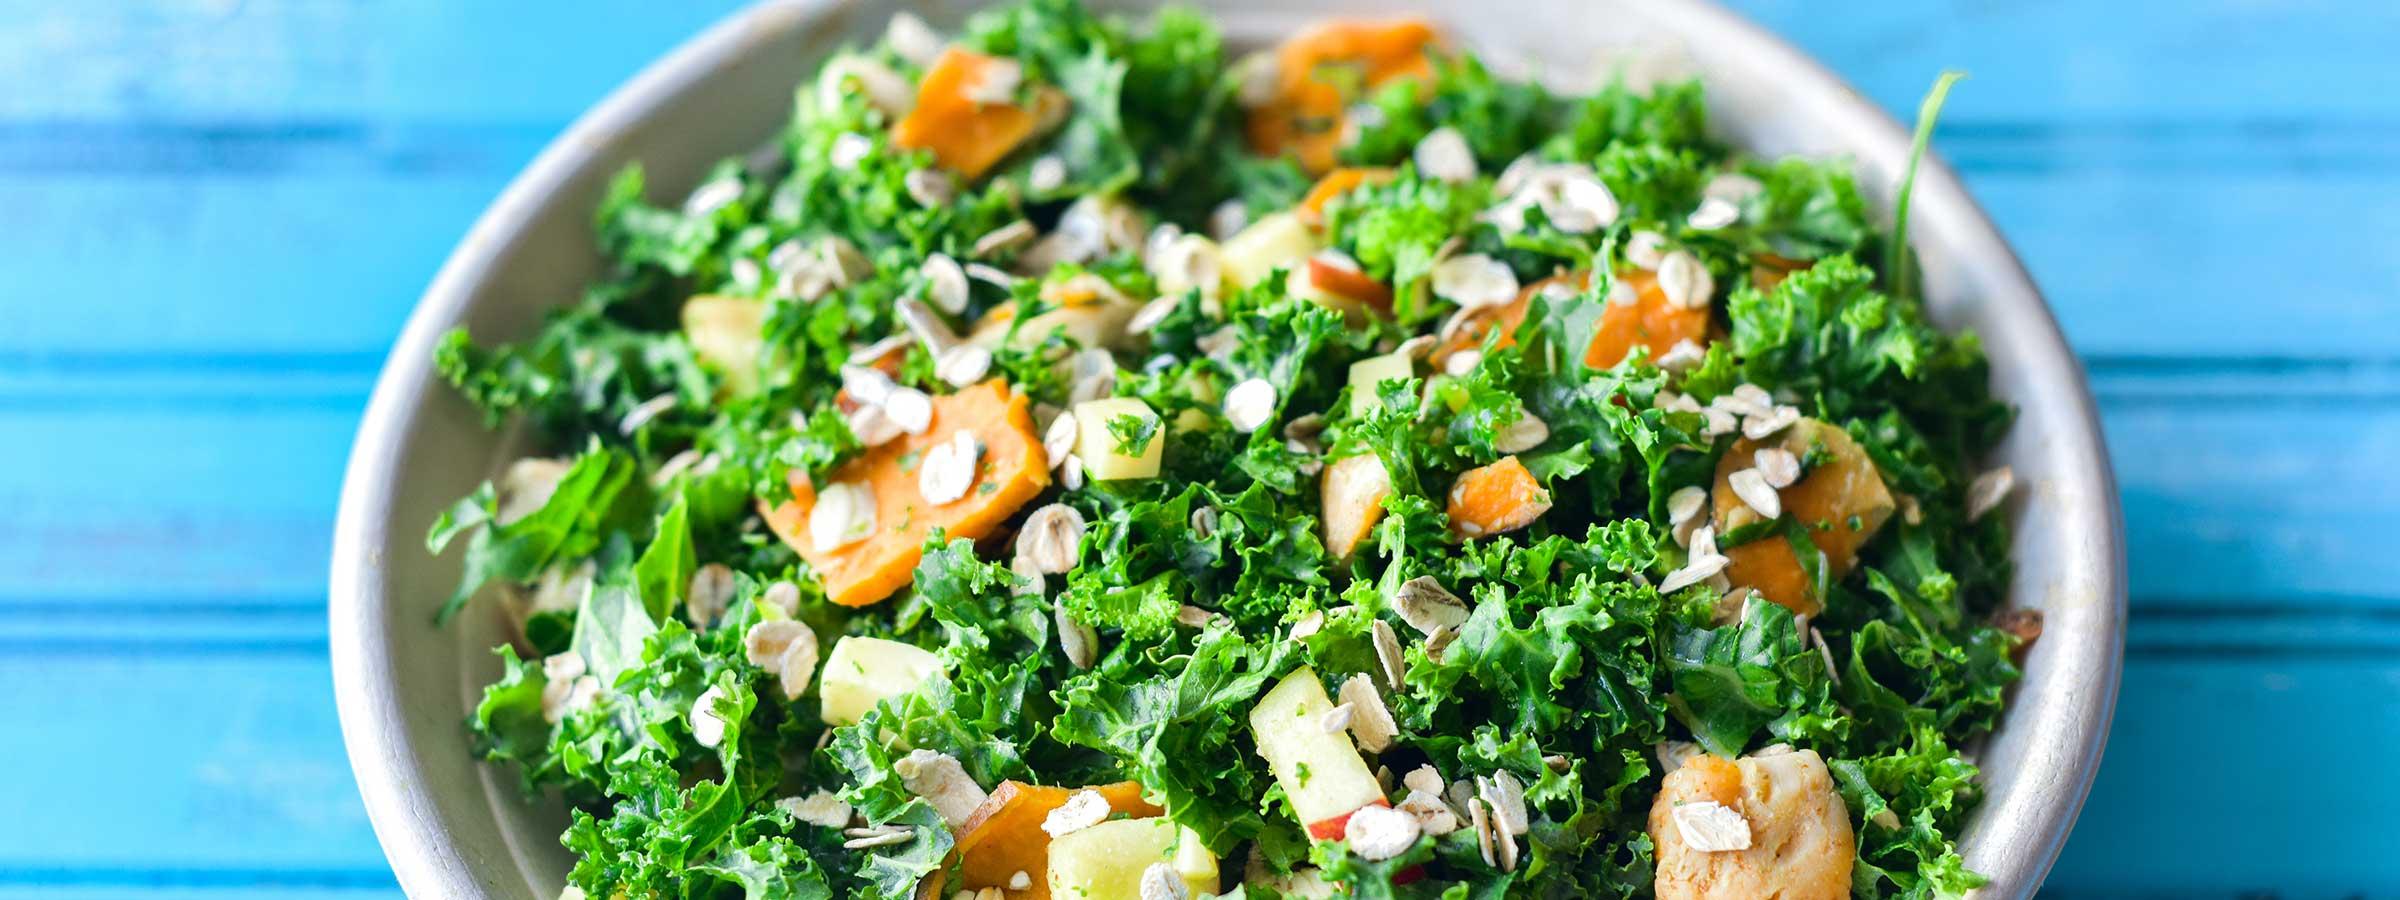 classic kale salad hero